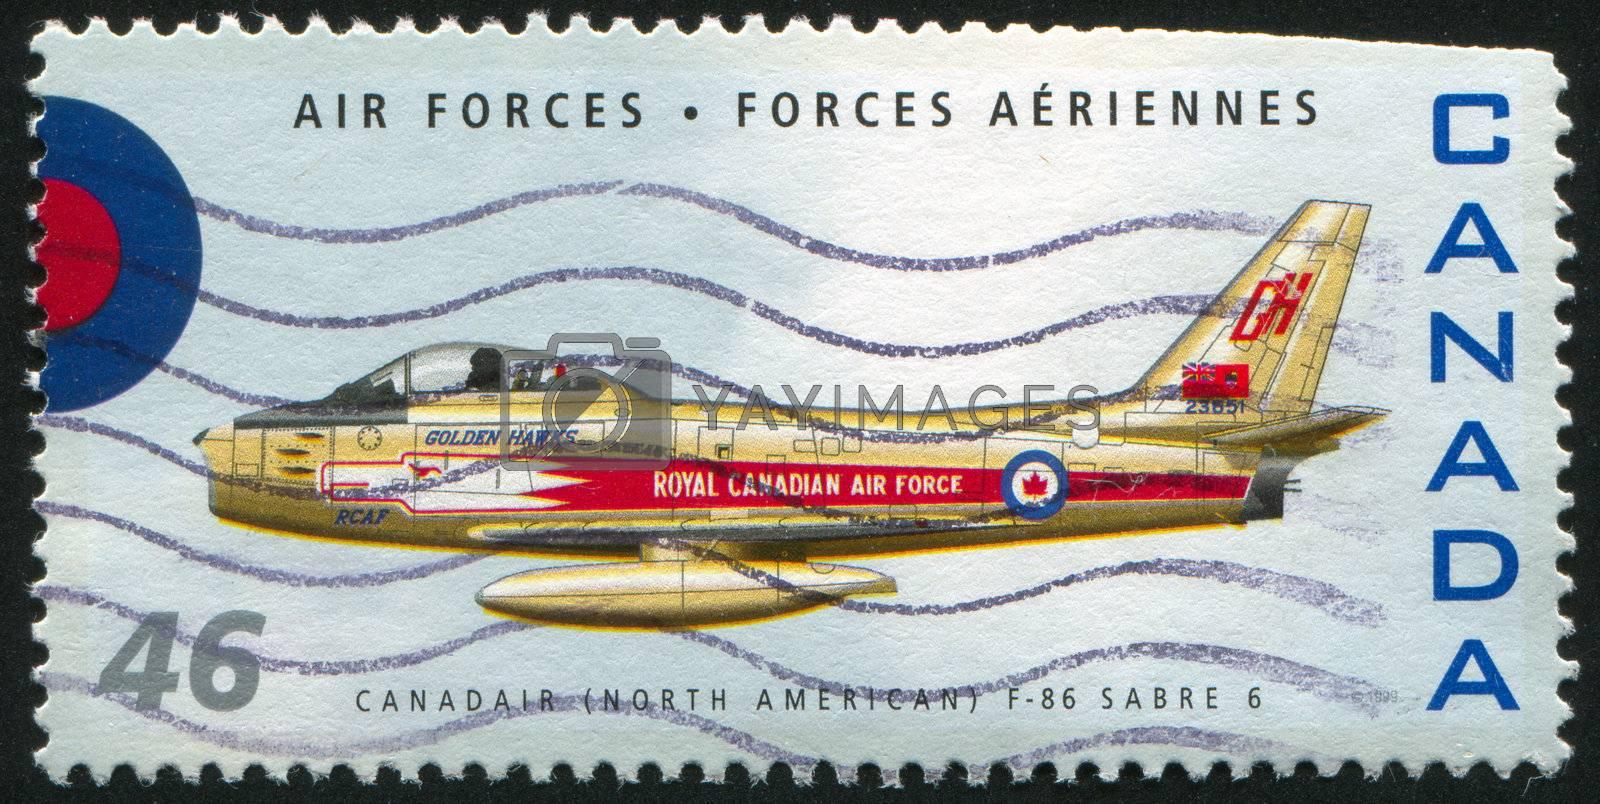 CANADA - CIRCA 1999: stamp printed by Canada, shows aeroplane, North American F-86 Sabre, circa 1999